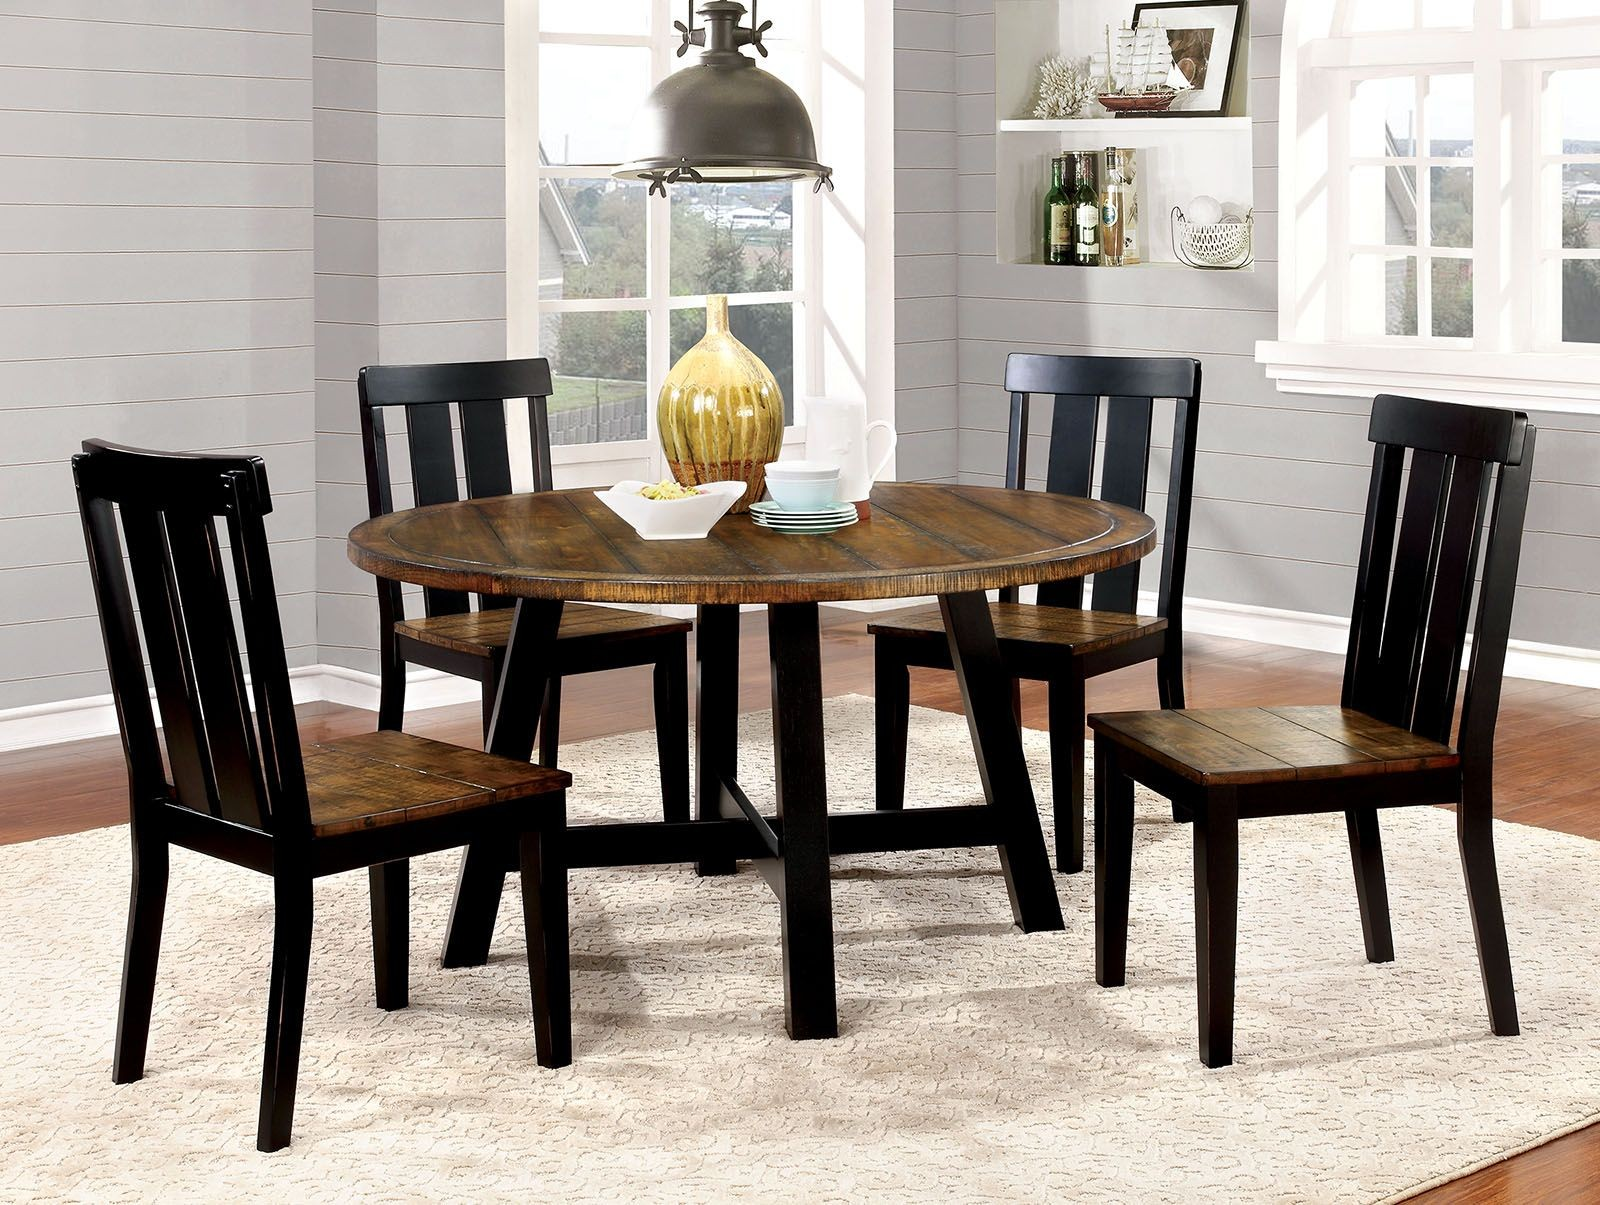 alana antique oak and black round dining room set from furniture of america coleman furniture. Black Bedroom Furniture Sets. Home Design Ideas